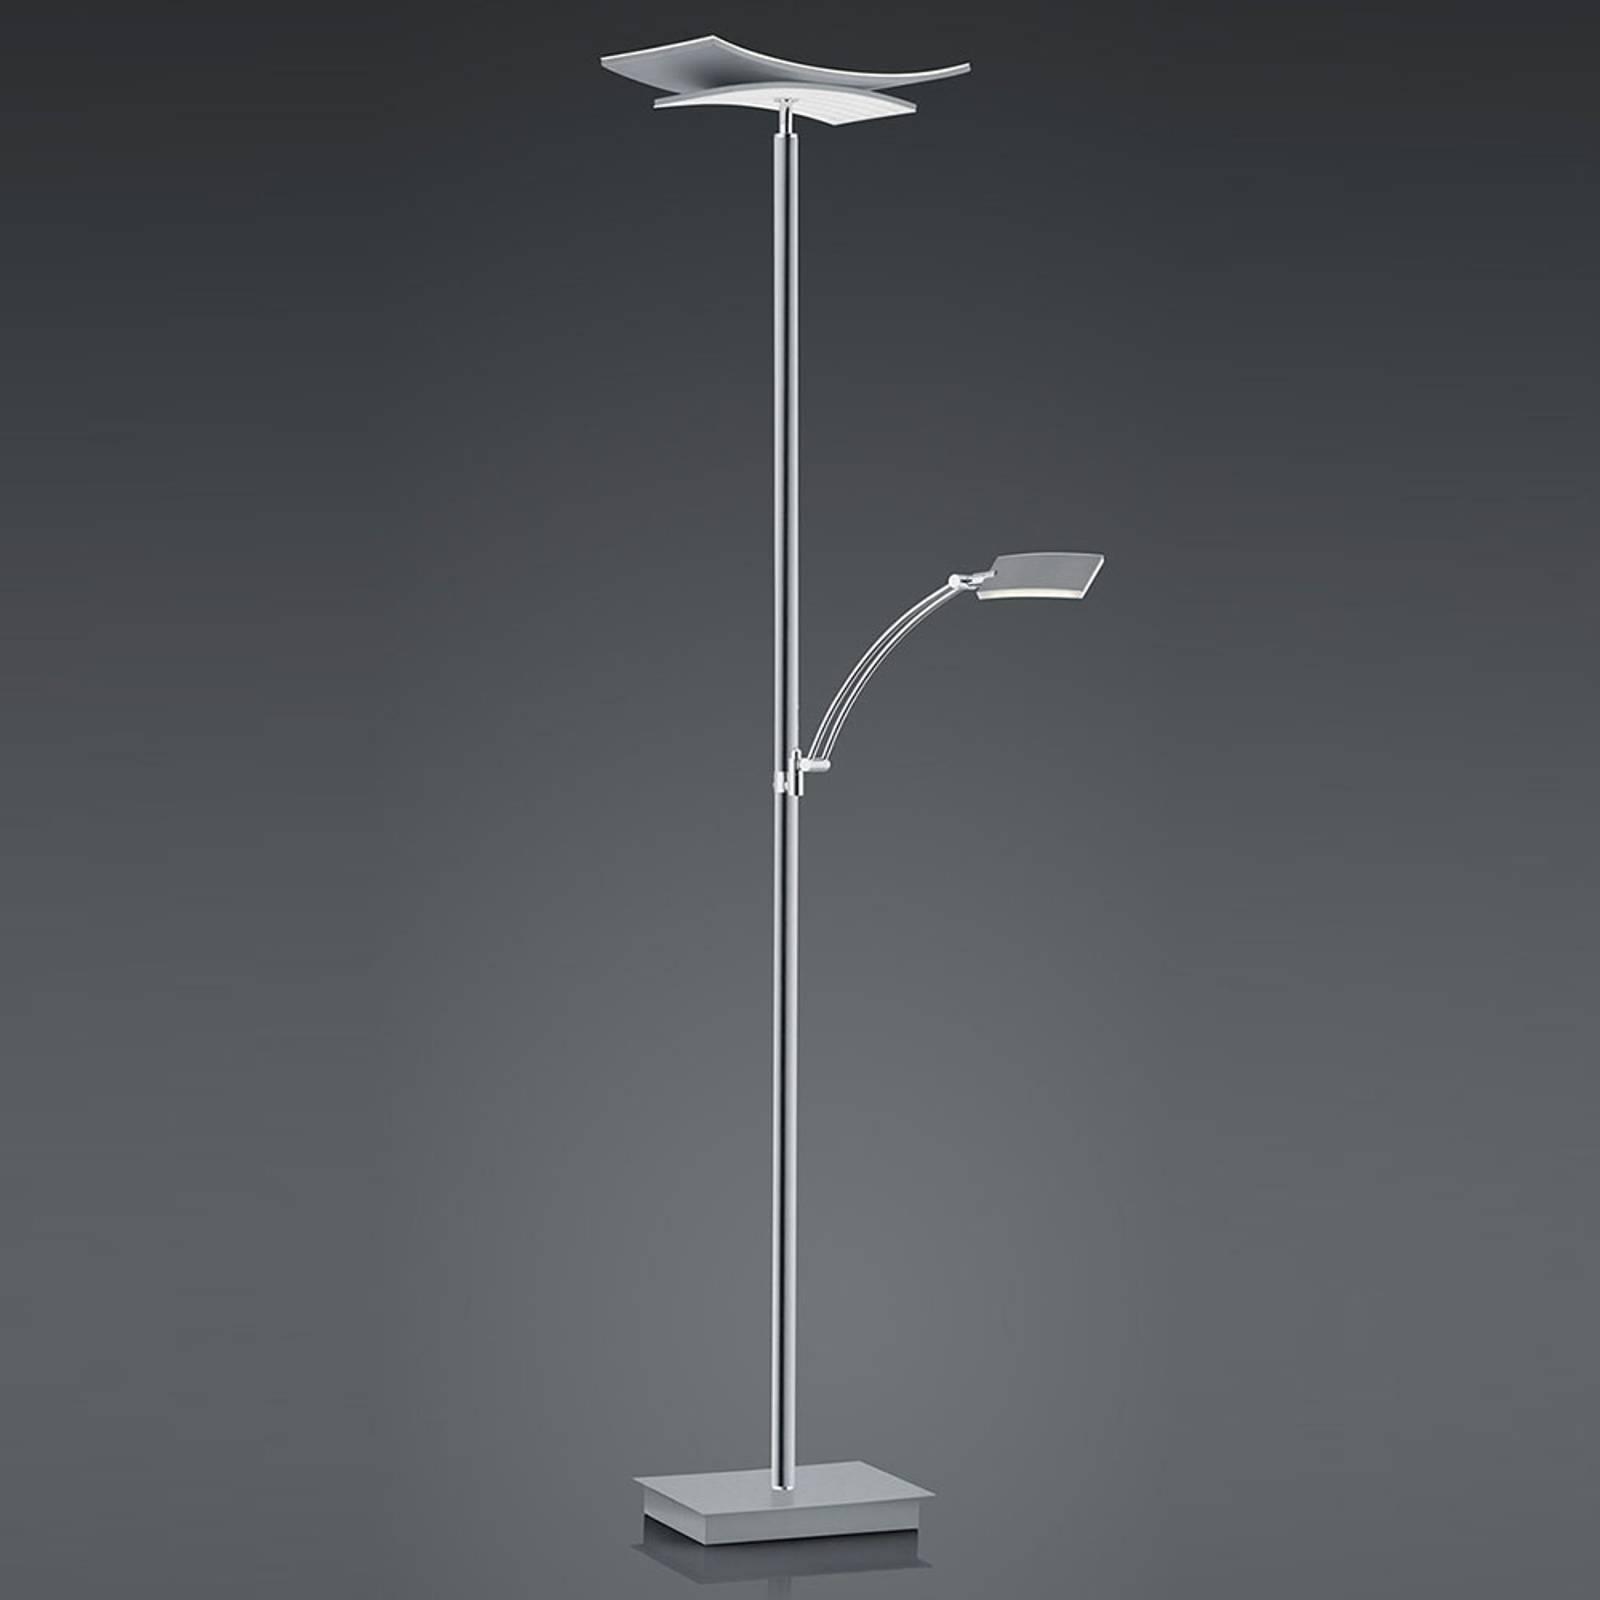 B-Leuchten Liberty lampa stojąca LED ramię nikiel